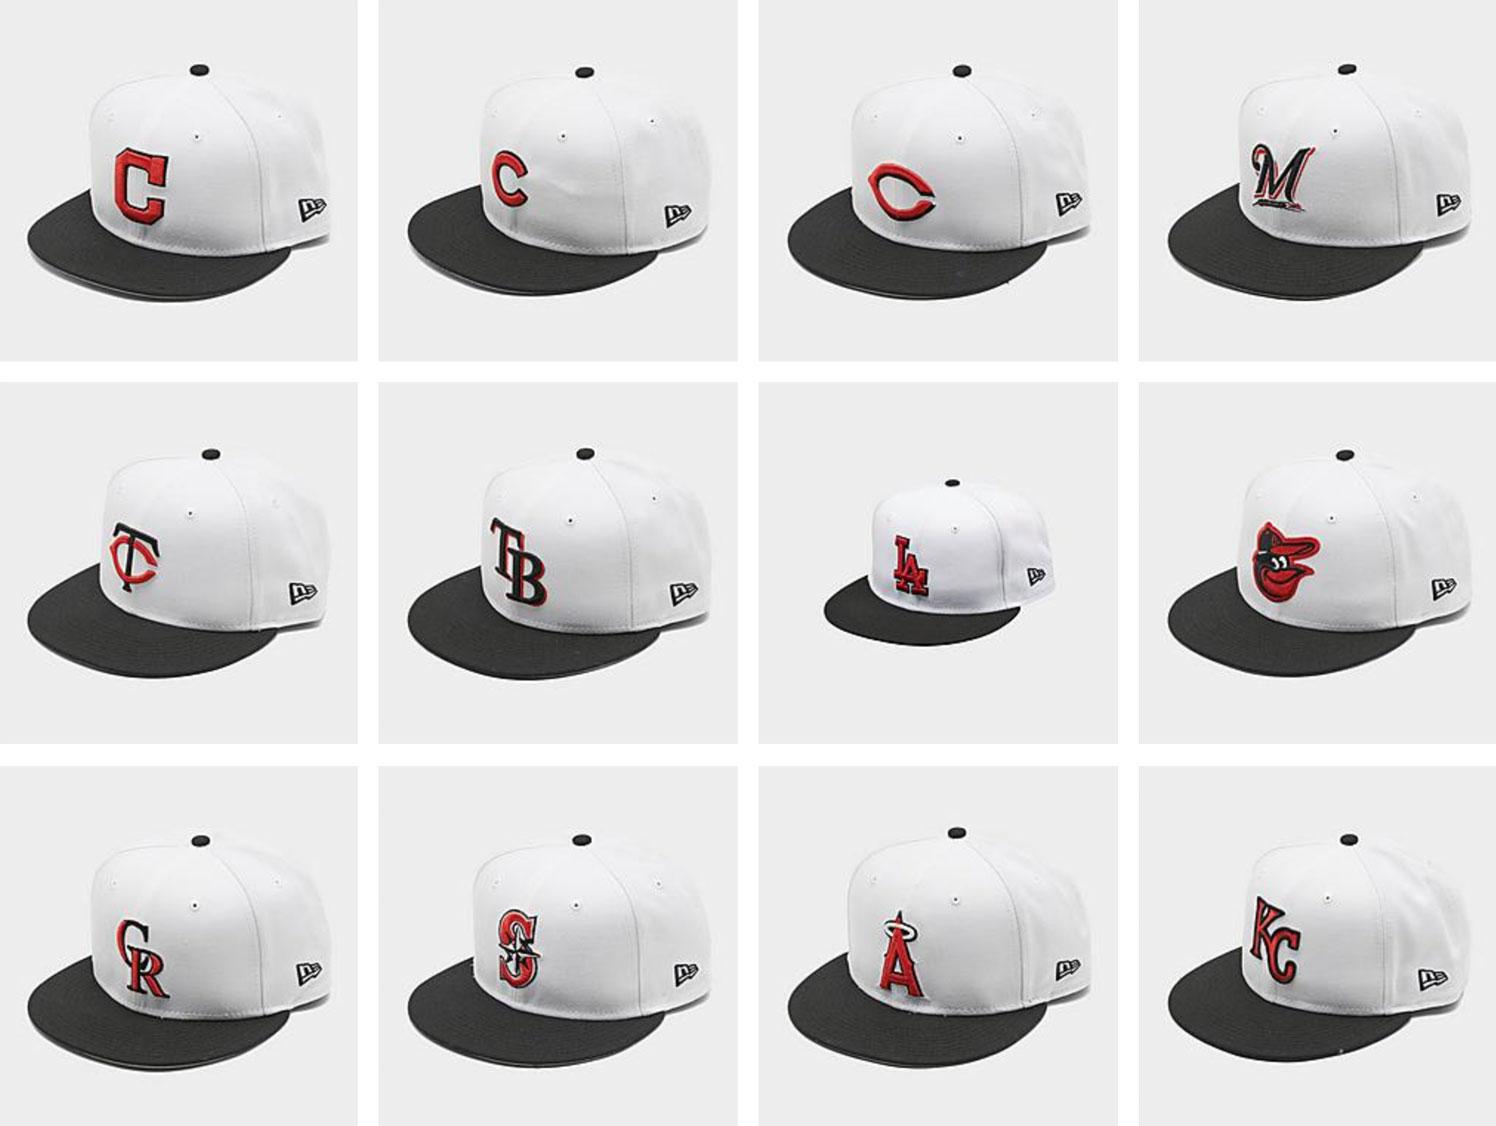 jordan-11-low-white-black-red-new-era-hats